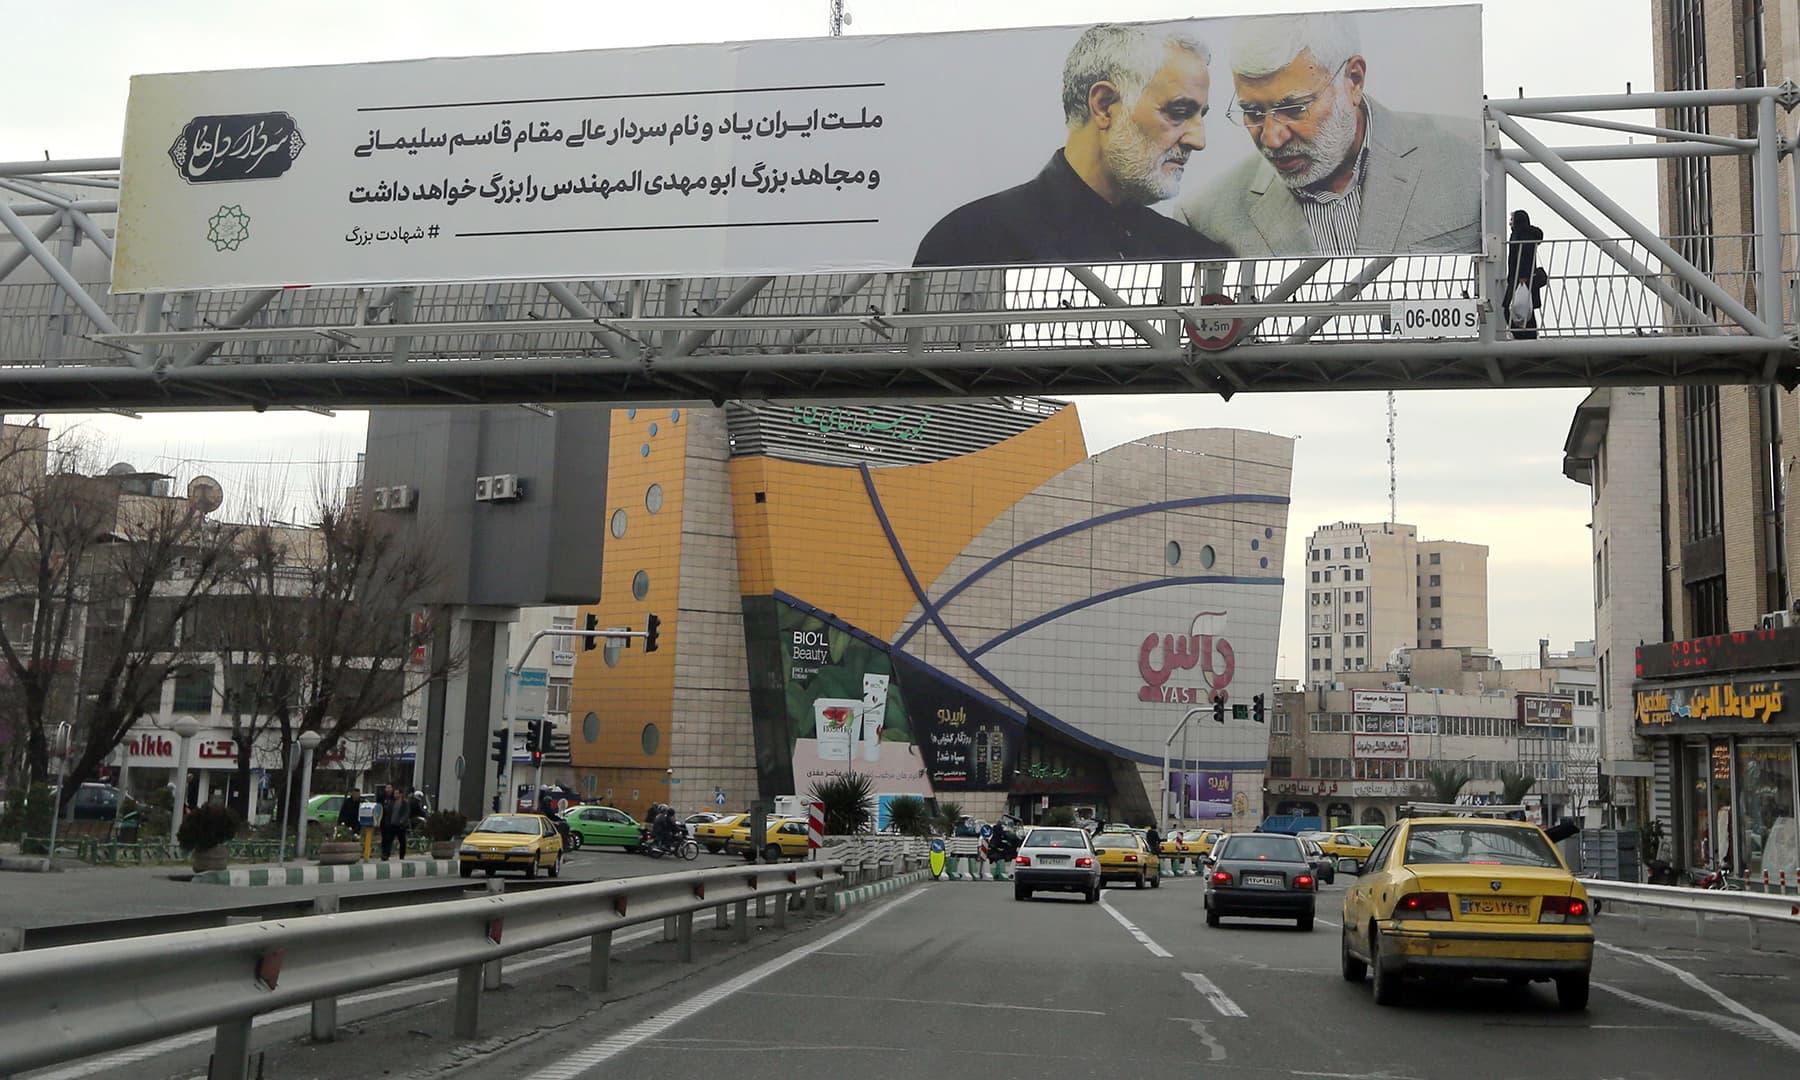 A billboard bearing a portrait of slain Iranian military commander Qasem Soleimani (L) and Iraqi paramilitary chief Abu Mahdi al-Muhandis hangs on a main road in the Iranian capital Tehran on Saturday. — AFP